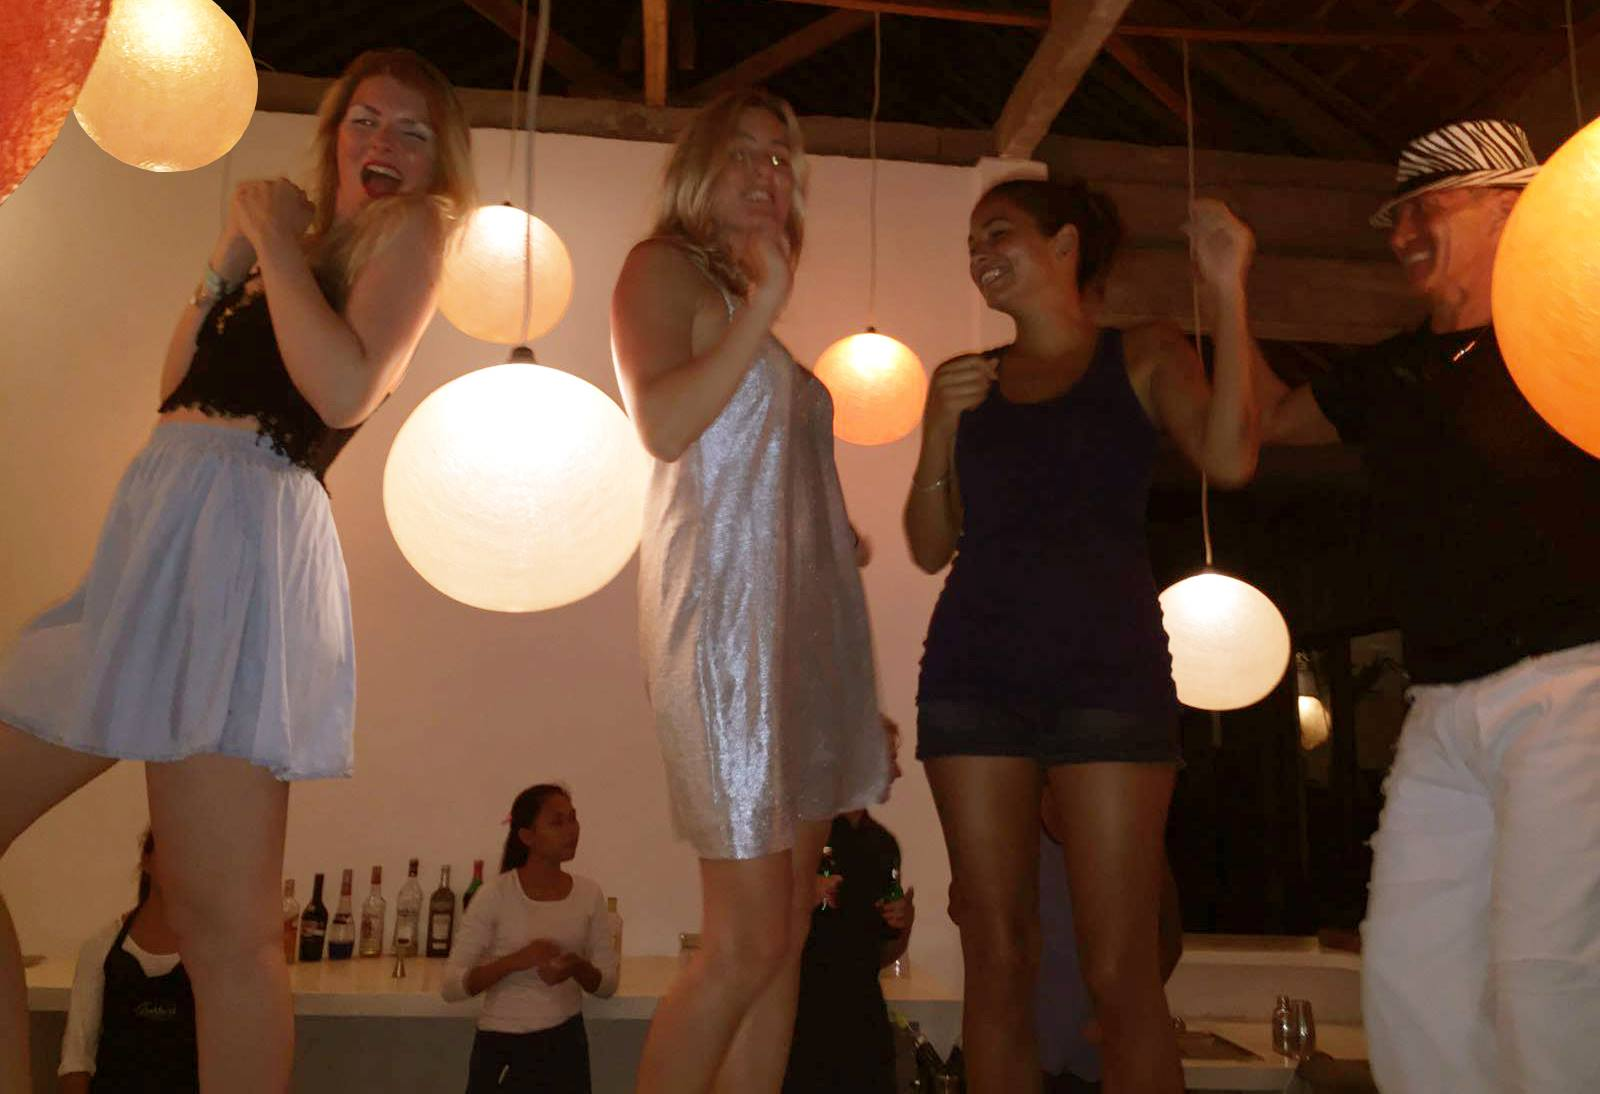 ashtari-restaurant-and-yoga-shala-indonesia-5